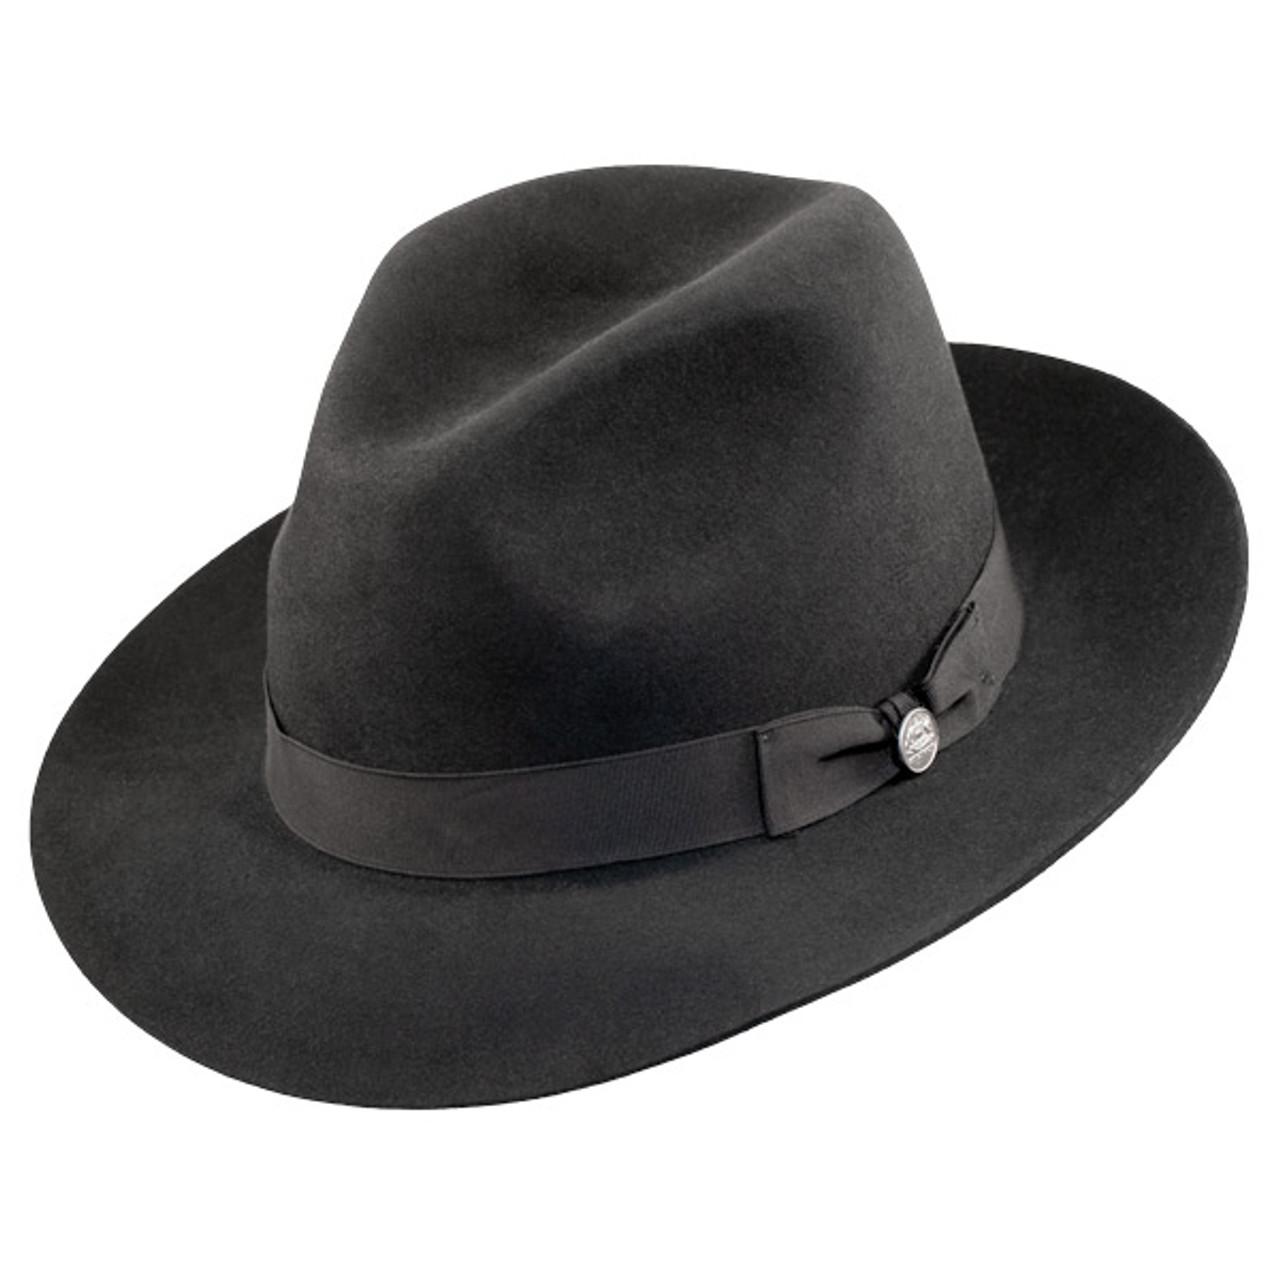 d5938cd13029 Stetson | Sutley Fur Felt Fedora | Hats Unlimited